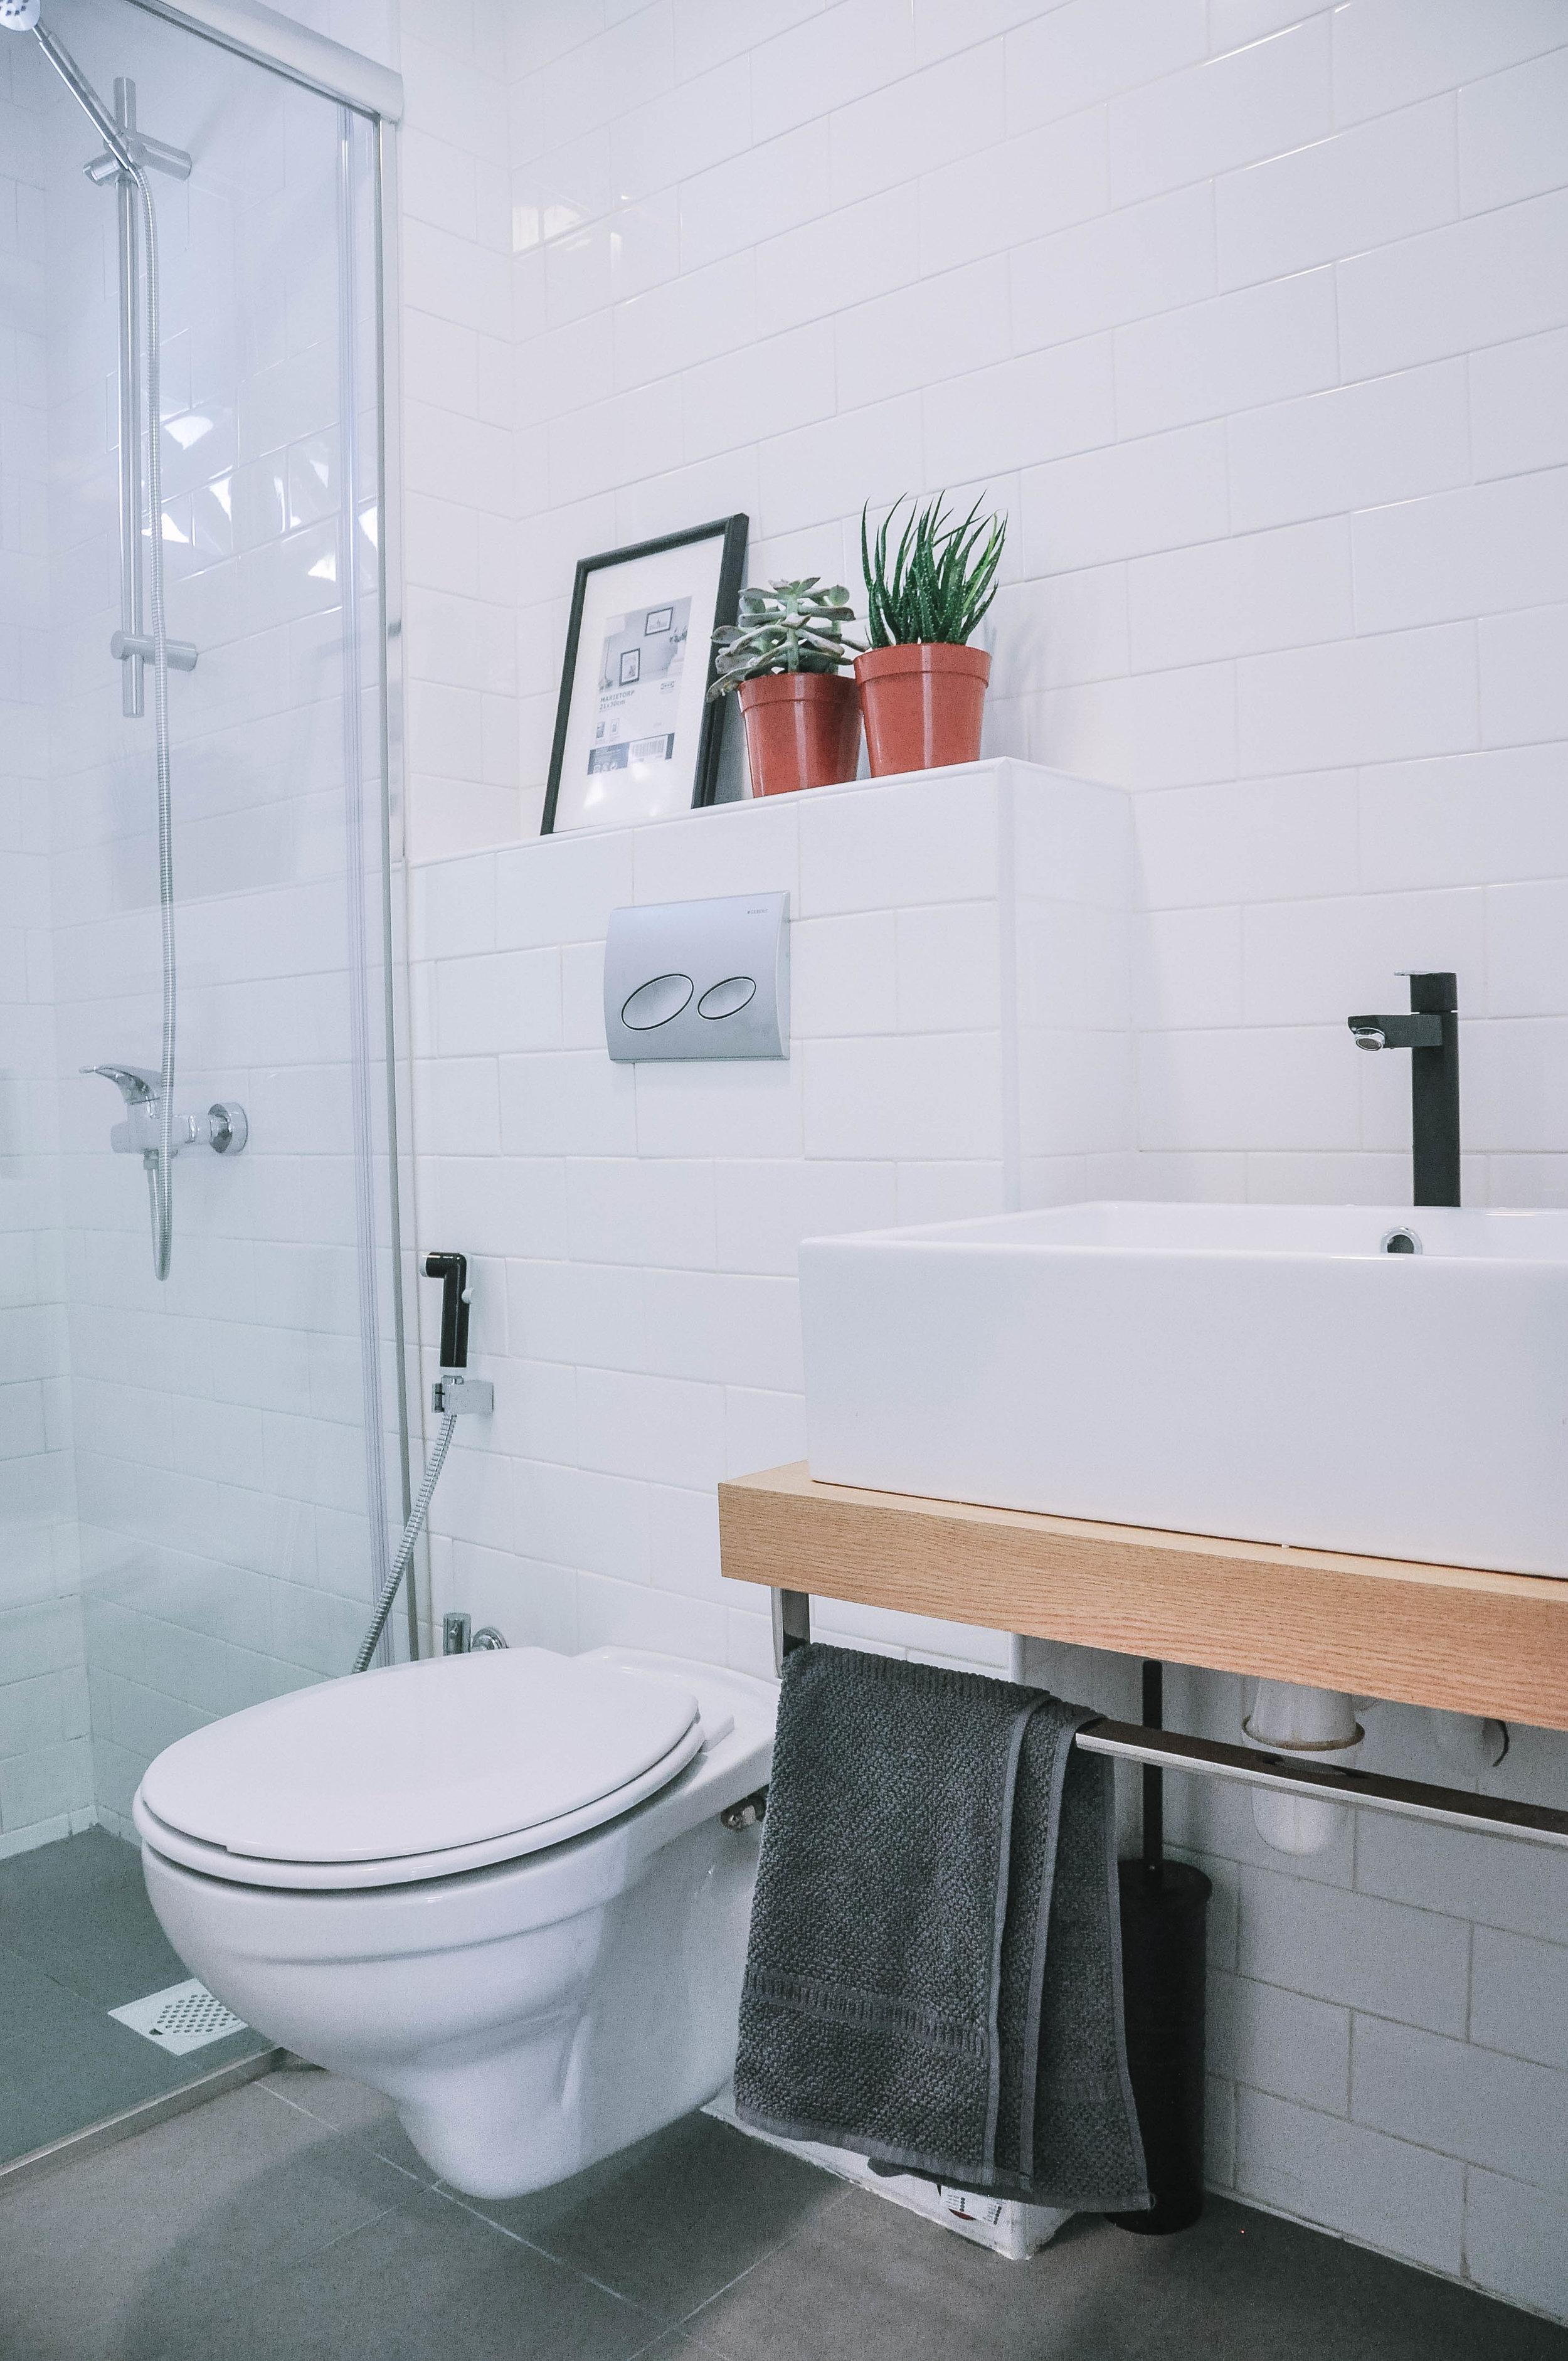 Stunning Simple White Bathroom Interior